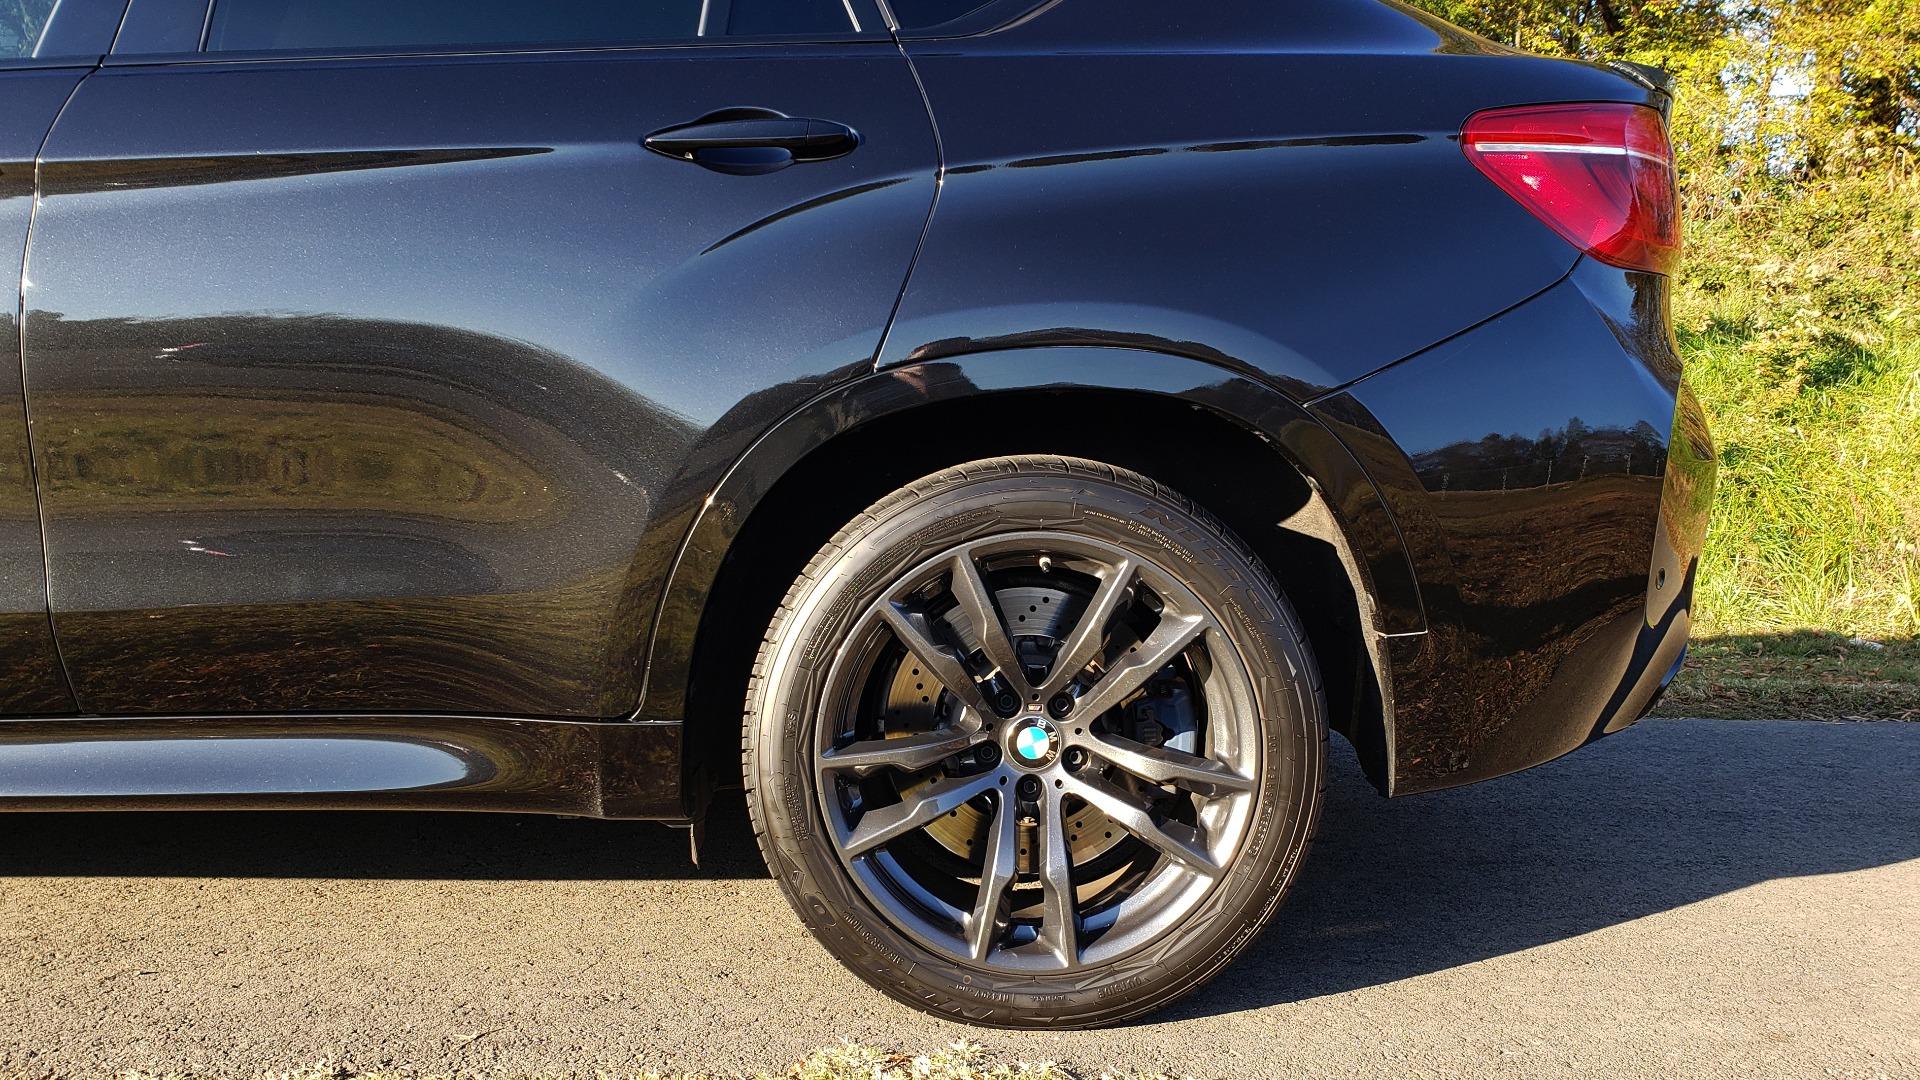 Used 2016 BMW X6 M EXEC PKG / DRVR ASST / NAV / SUNROOF / BLIND SPOT / REARVIEW for sale Sold at Formula Imports in Charlotte NC 28227 88